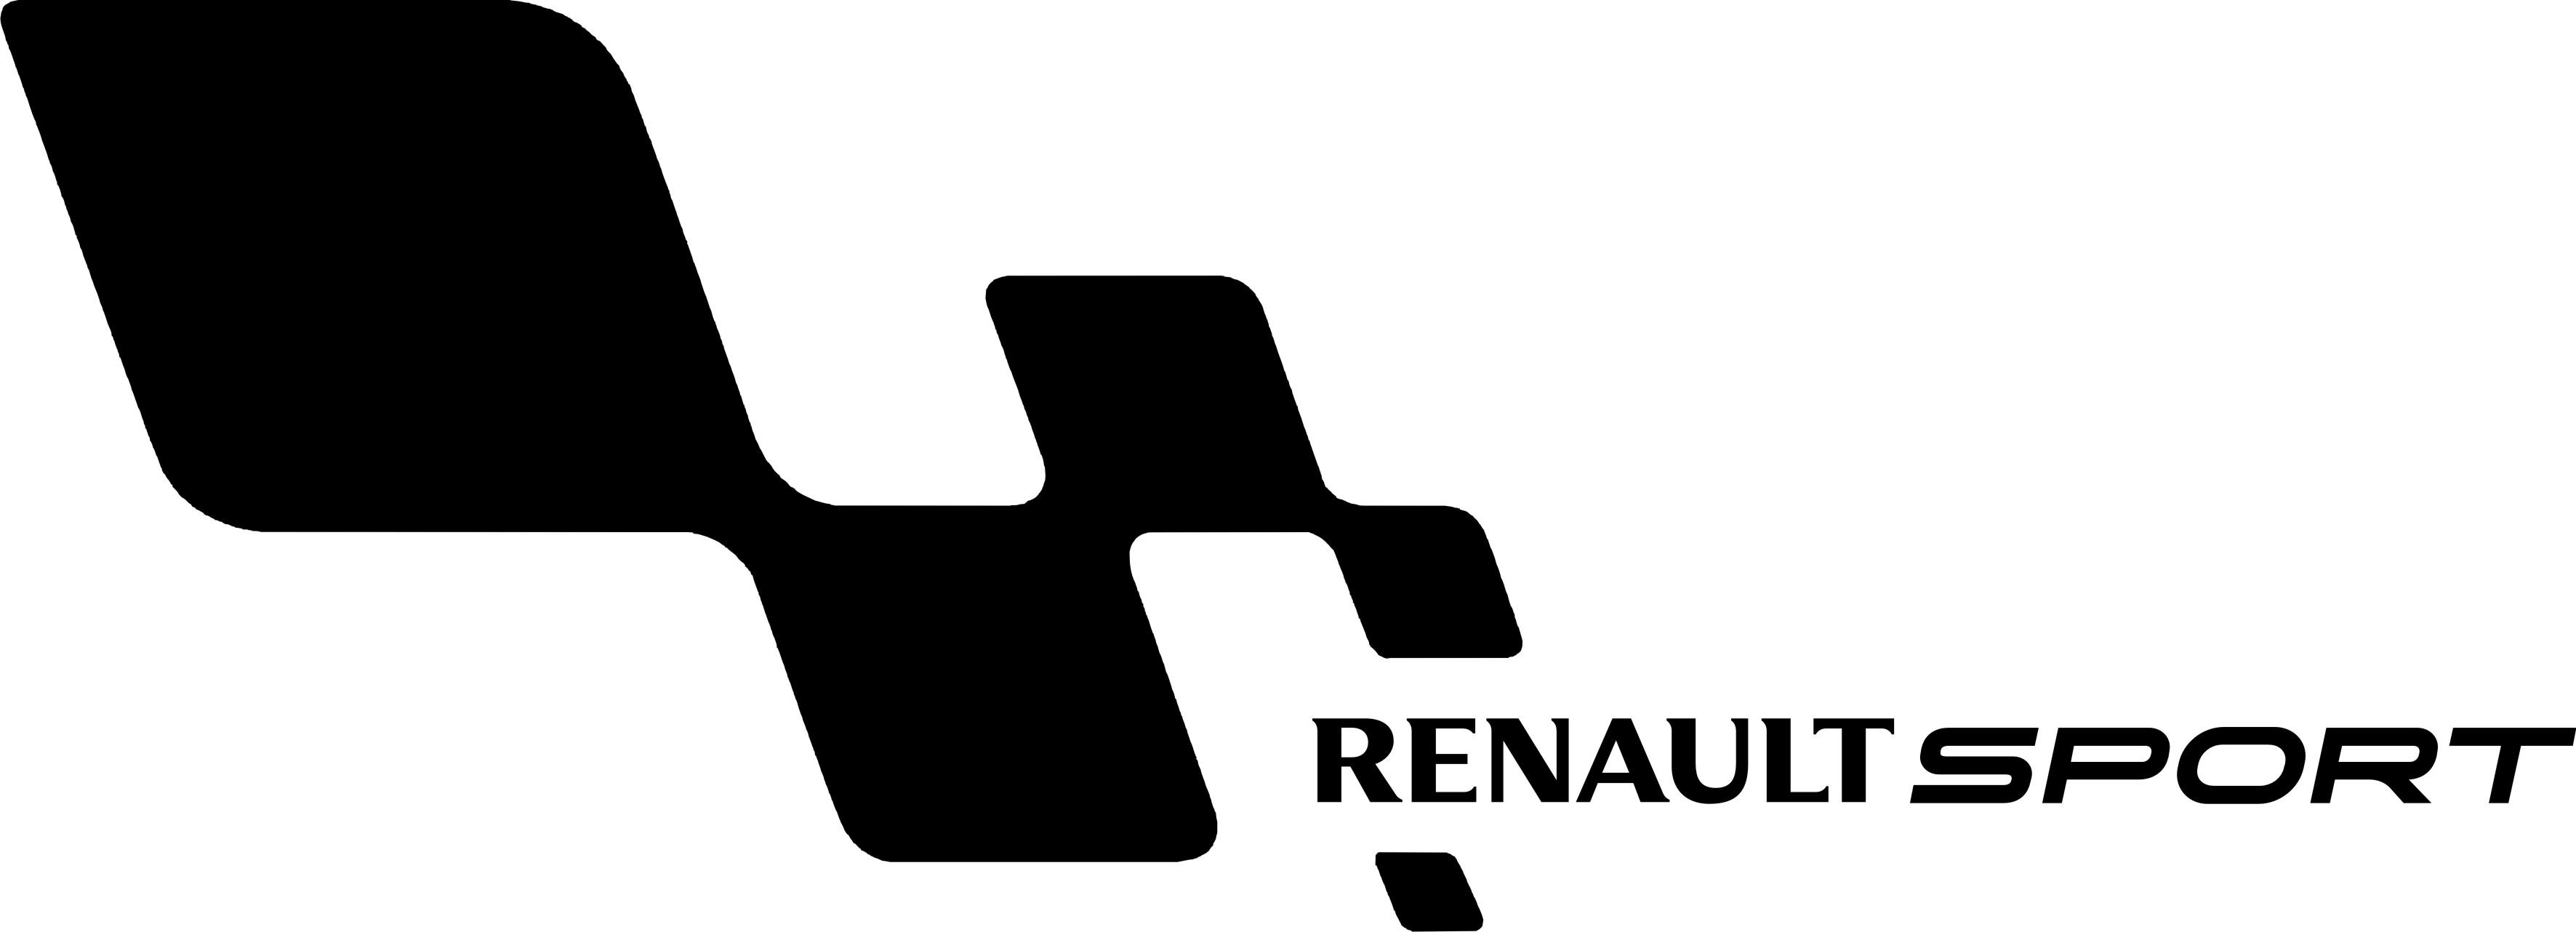 Renault Sport Logo Wallpaper